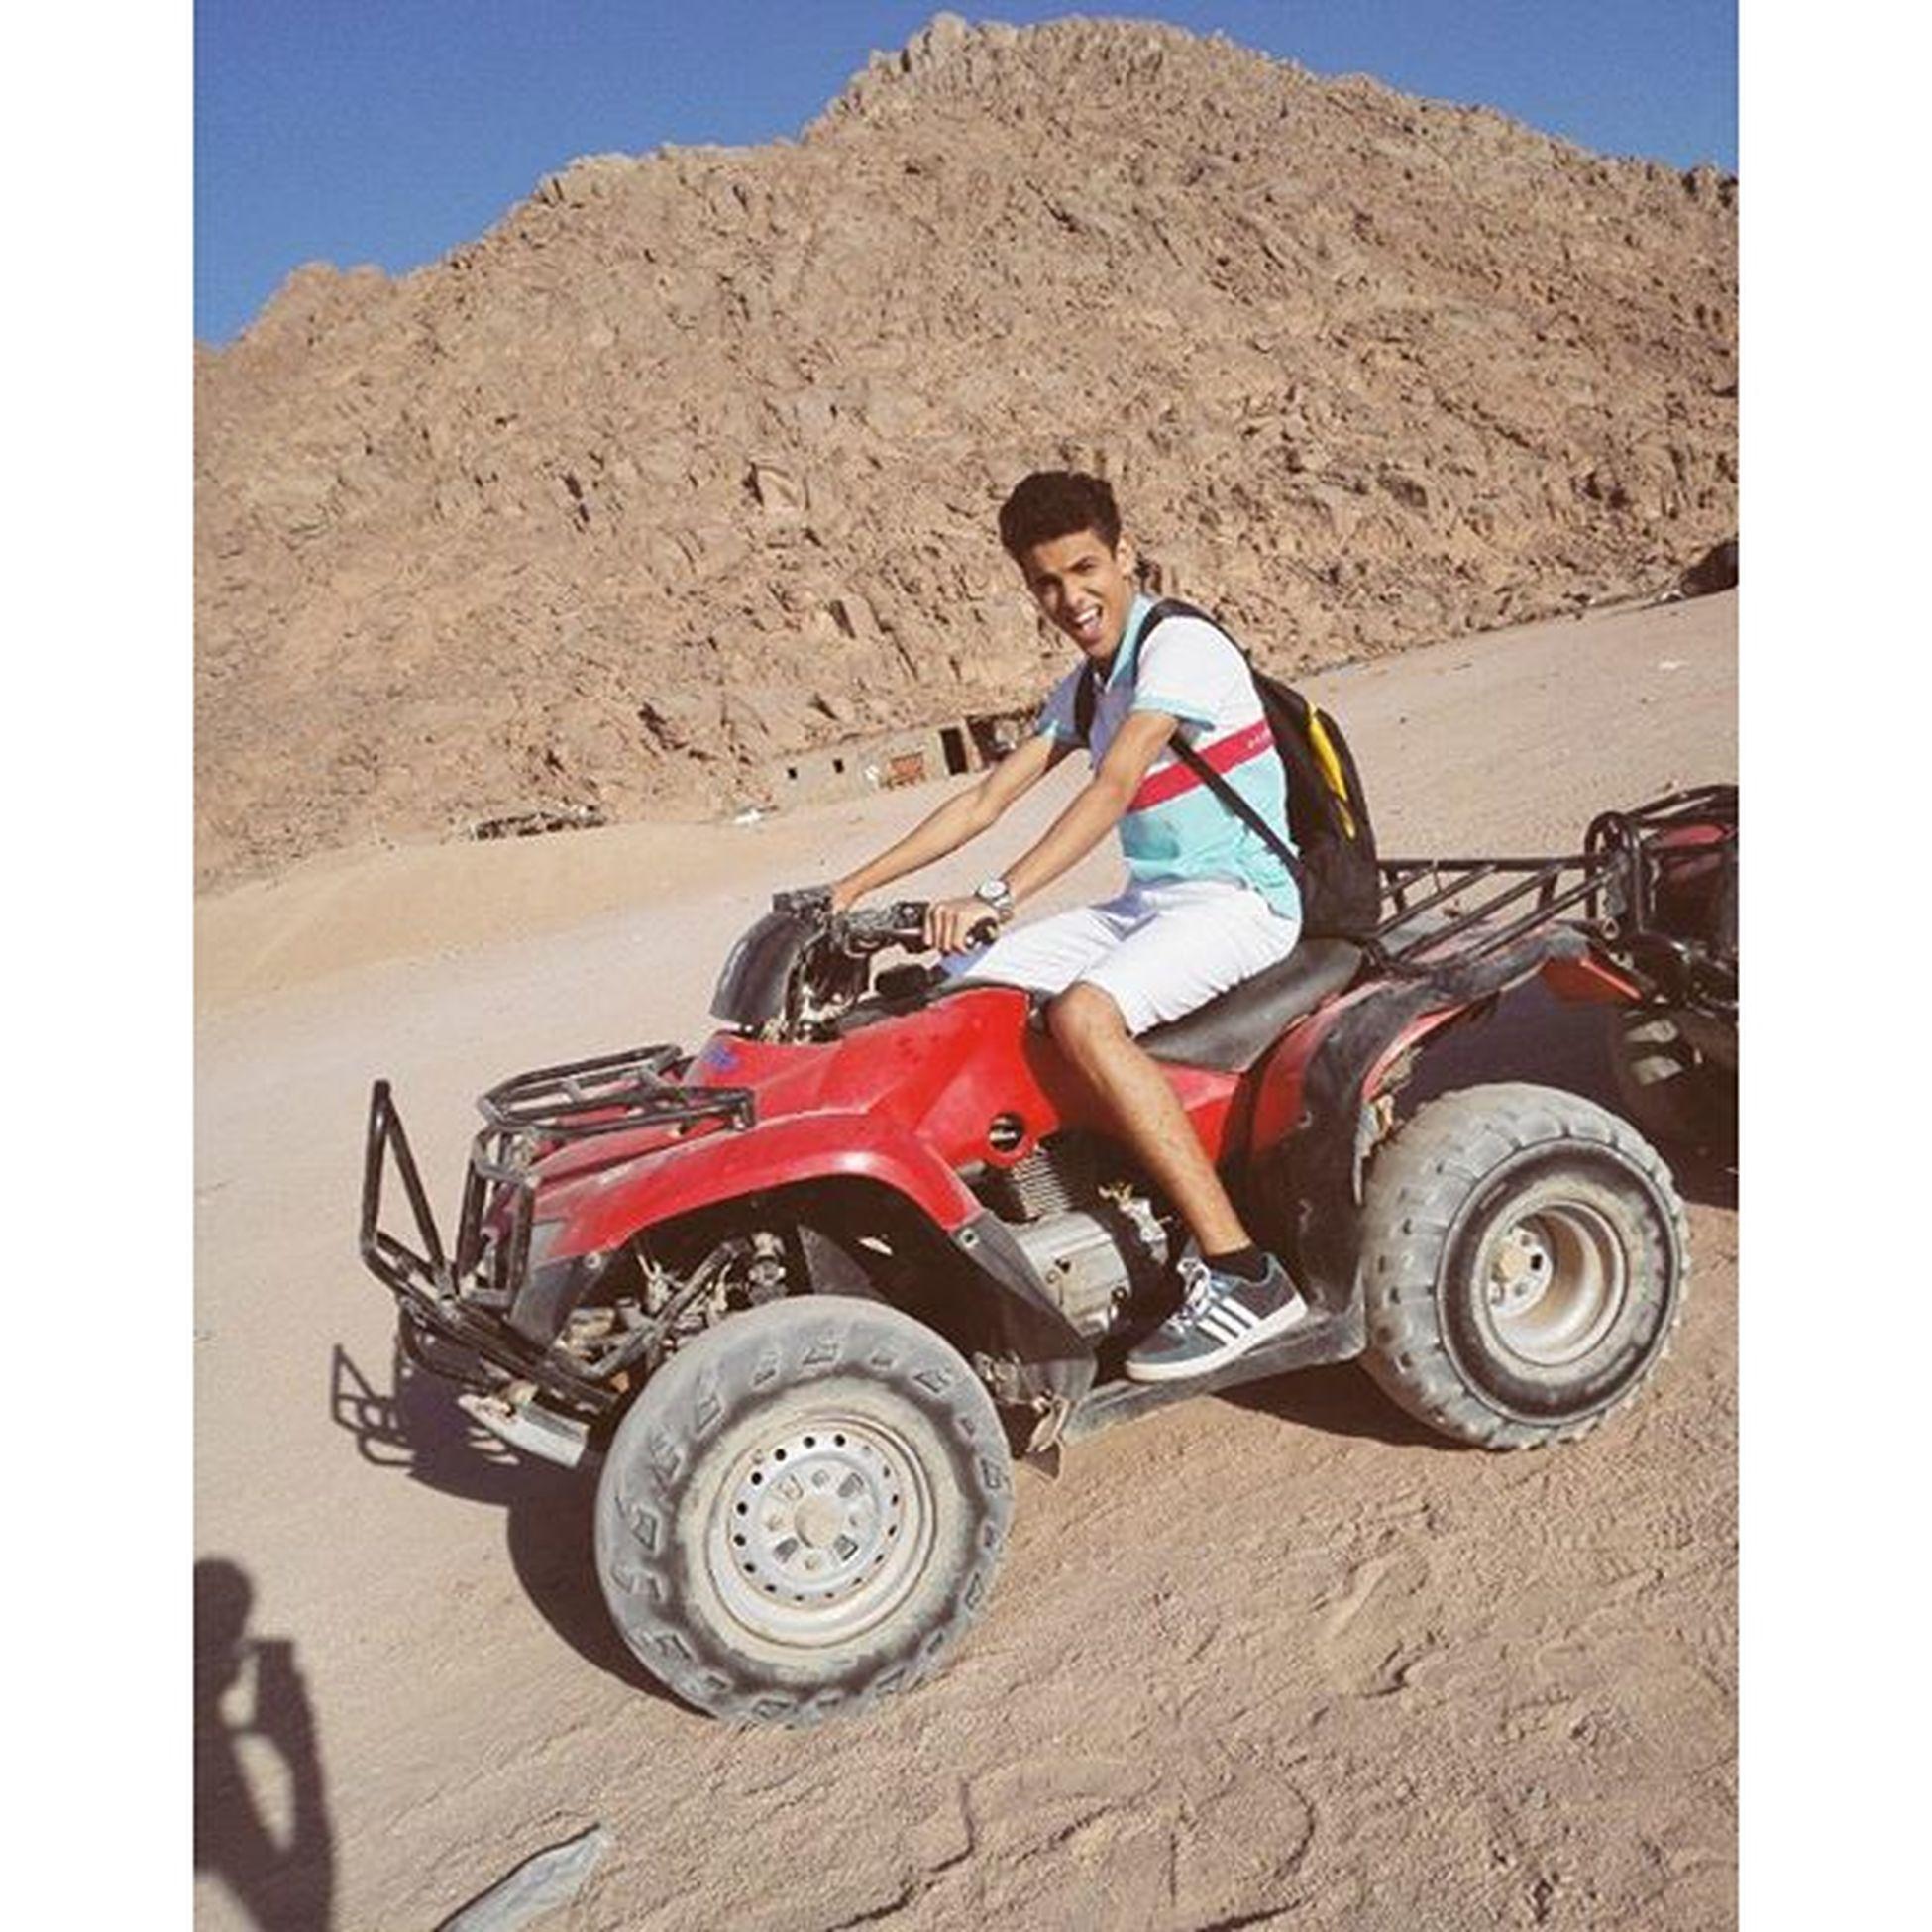 Beach_buggy Sharmelsheikh Safari 😀😀